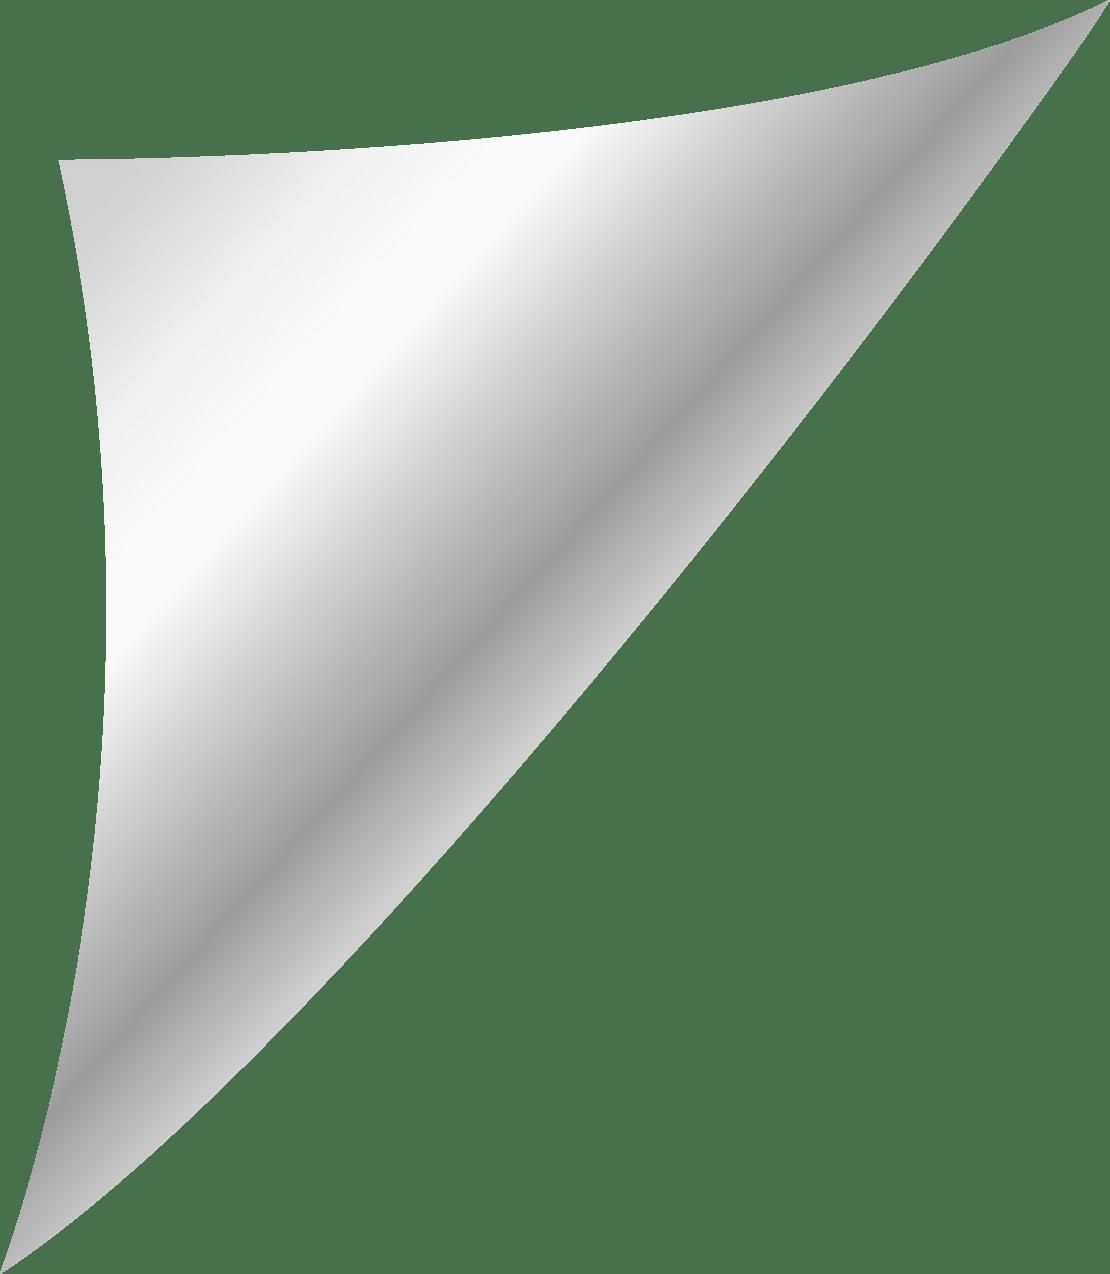 Learn Arabic Online | Learnalanguage com